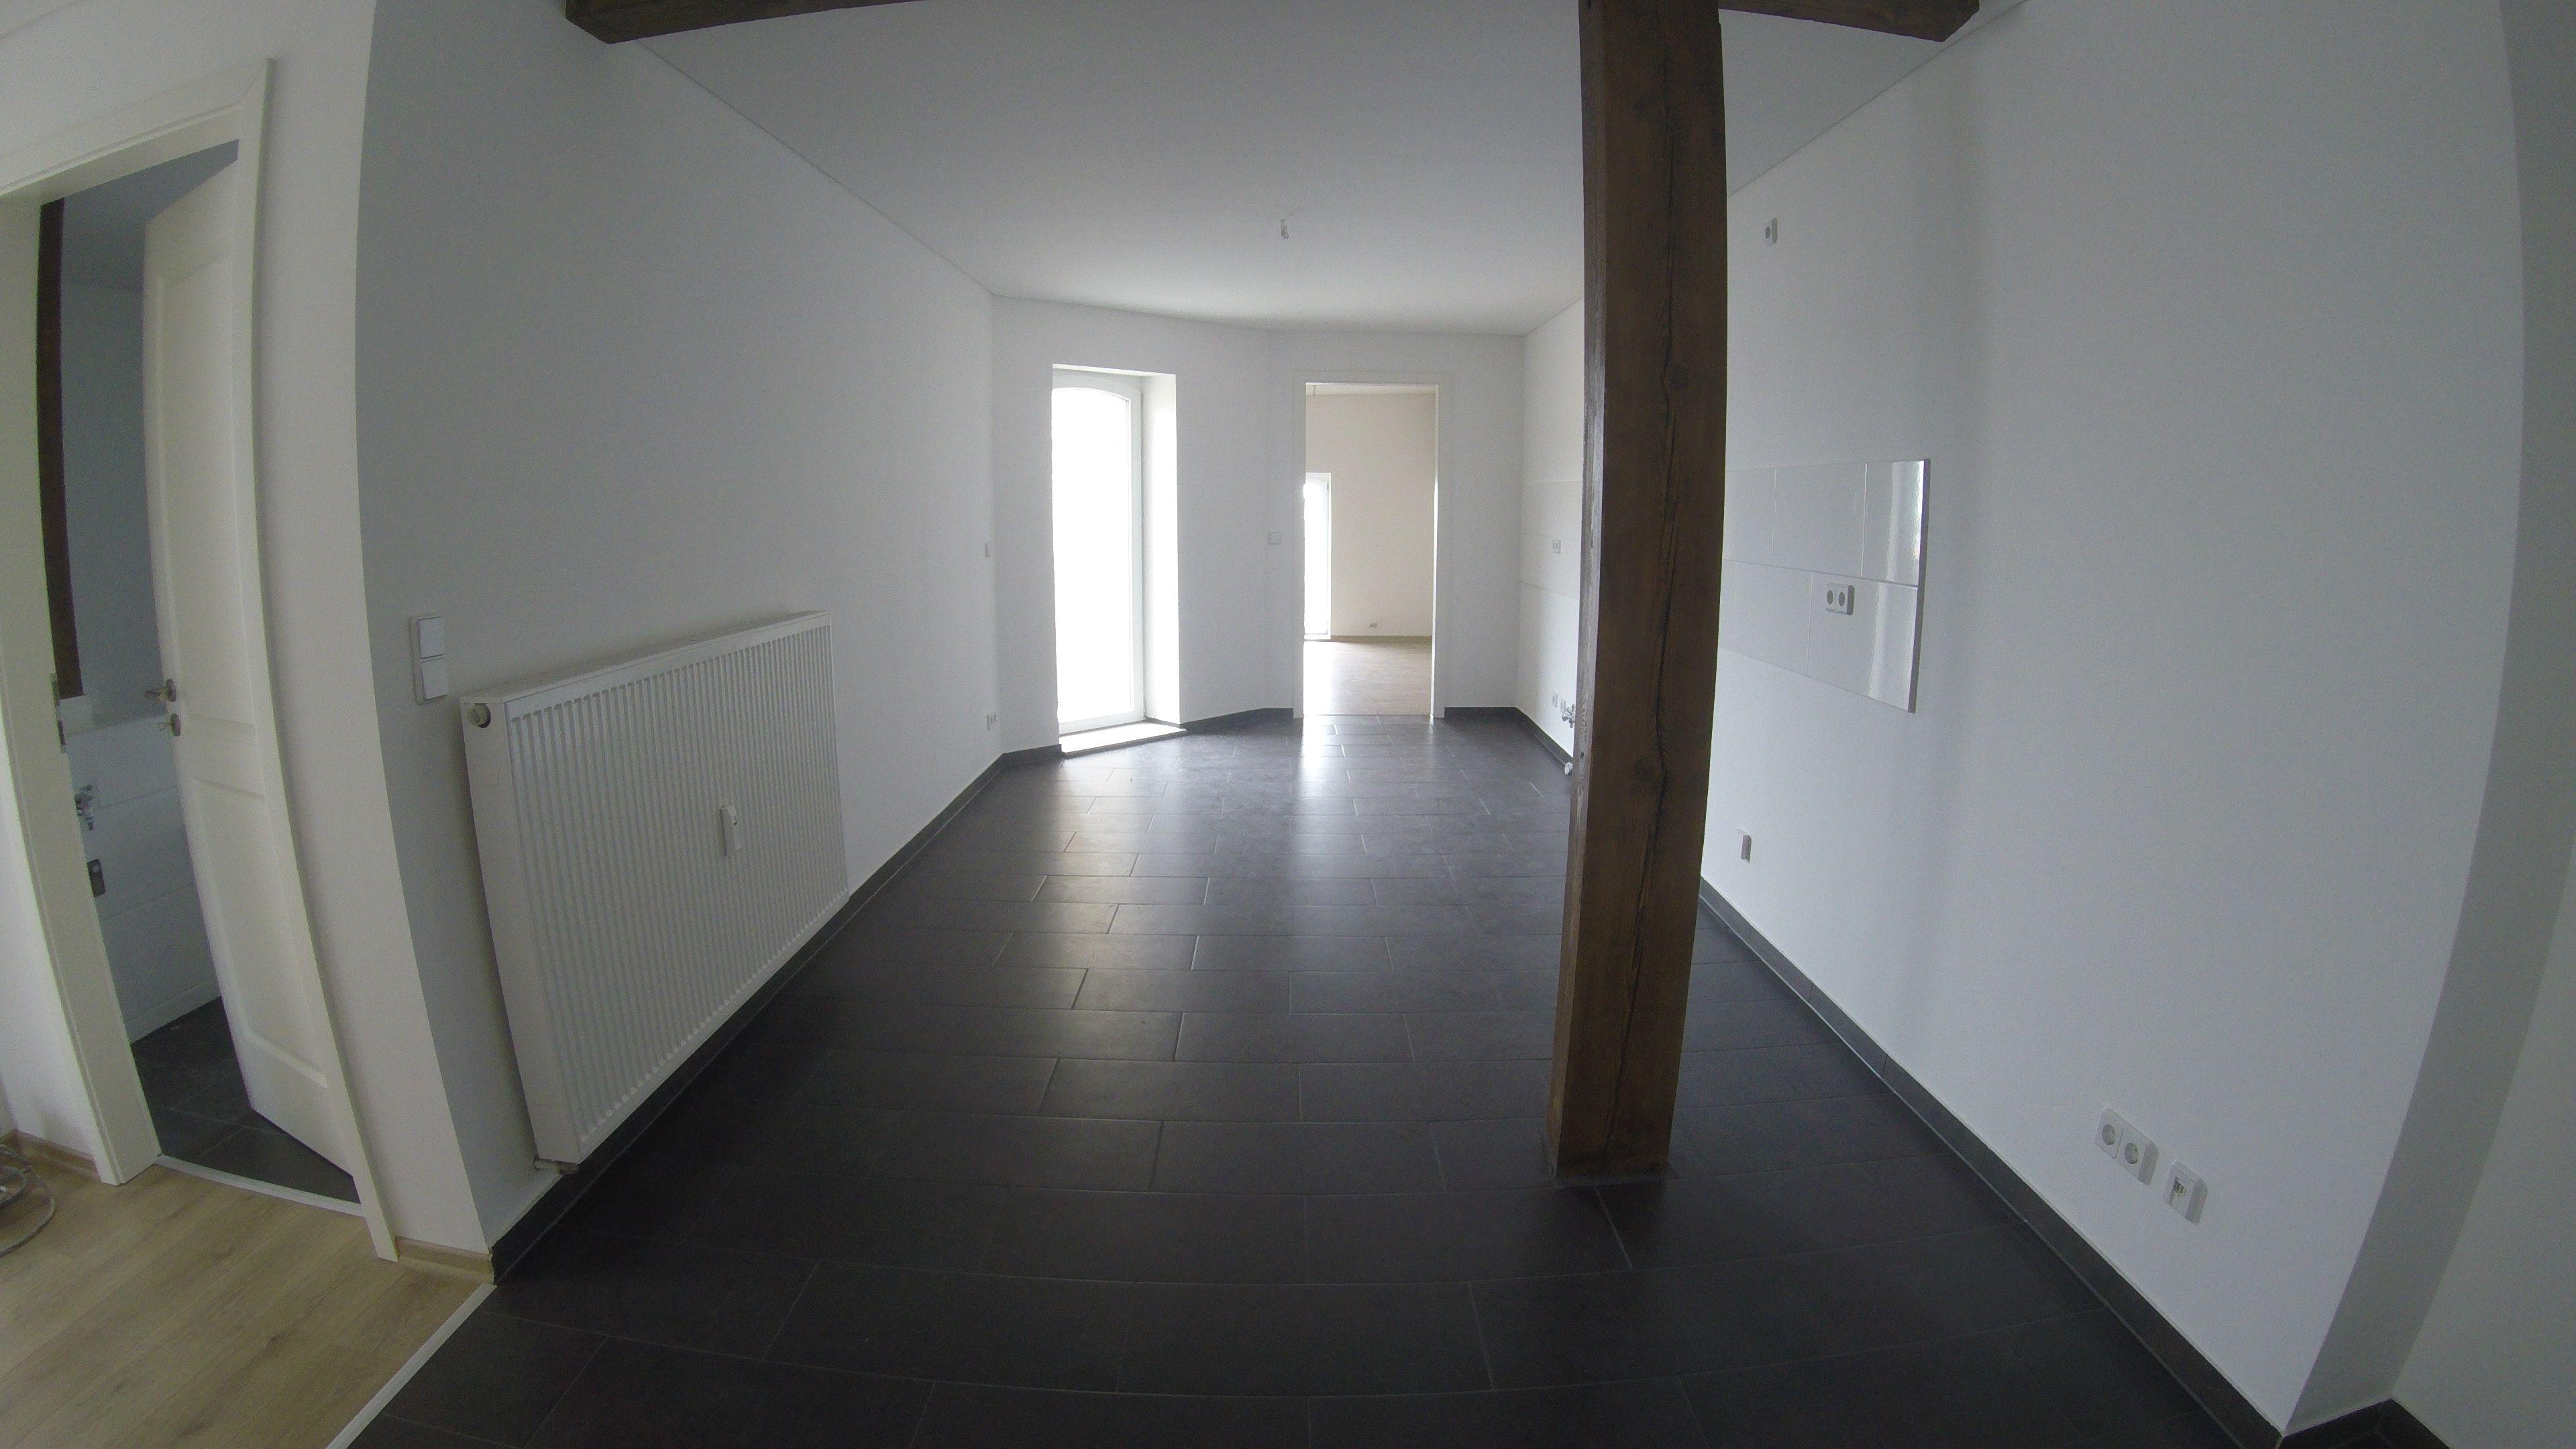 Wohnzimmer Dachgeschoss ~ T dachgeschoß zimmer mietwohnung halle saale wohnzimmer